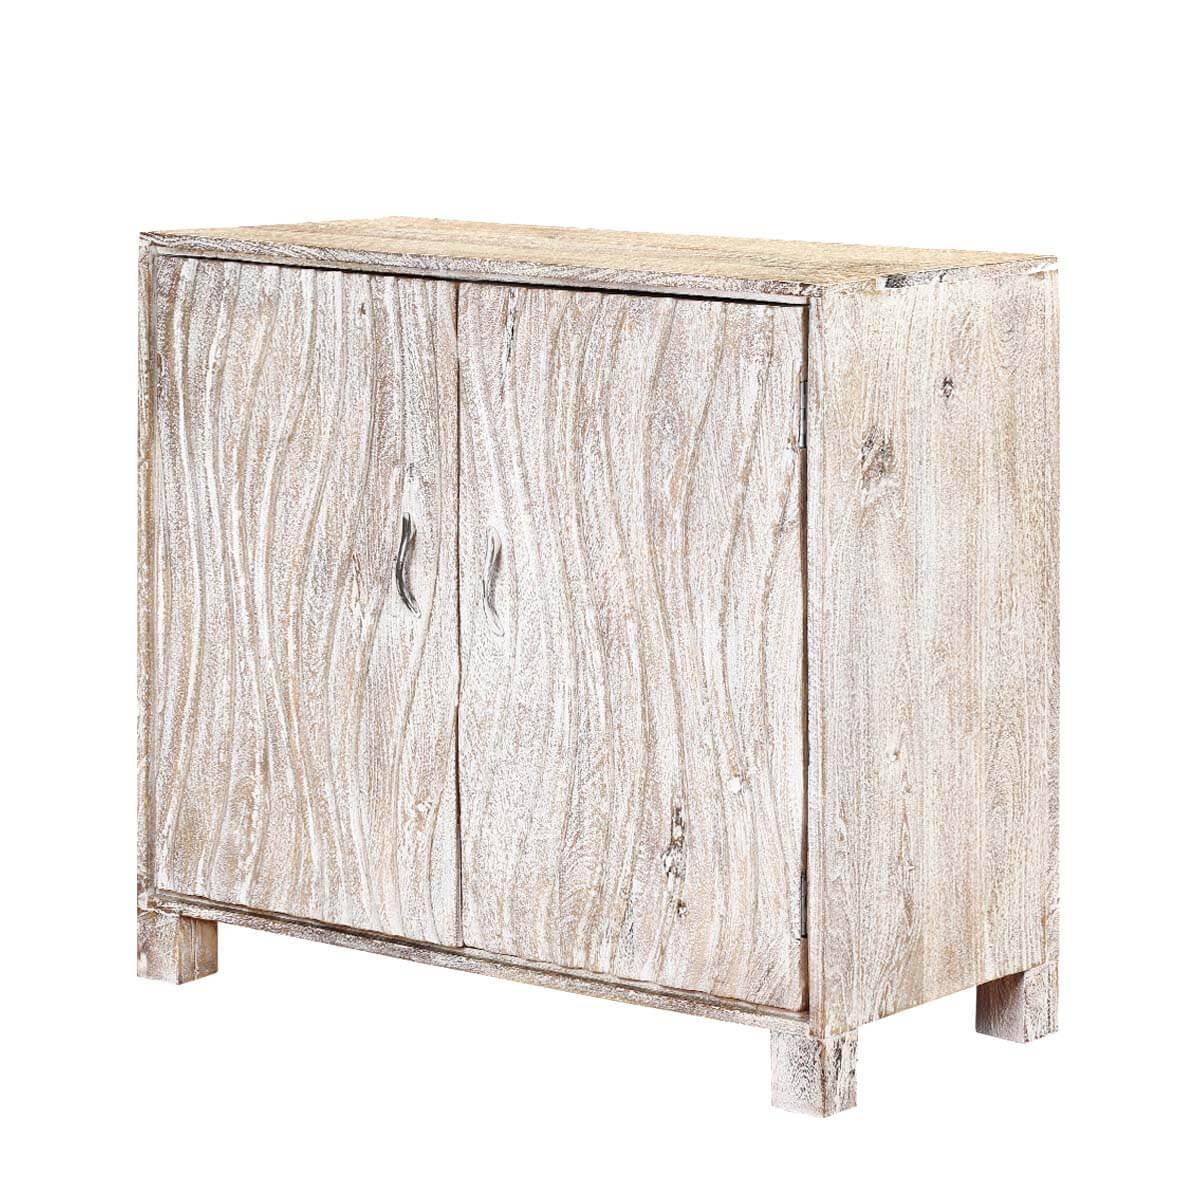 Merton White Wash Mango Wood Freestanding 2 Door Accent Cabinet